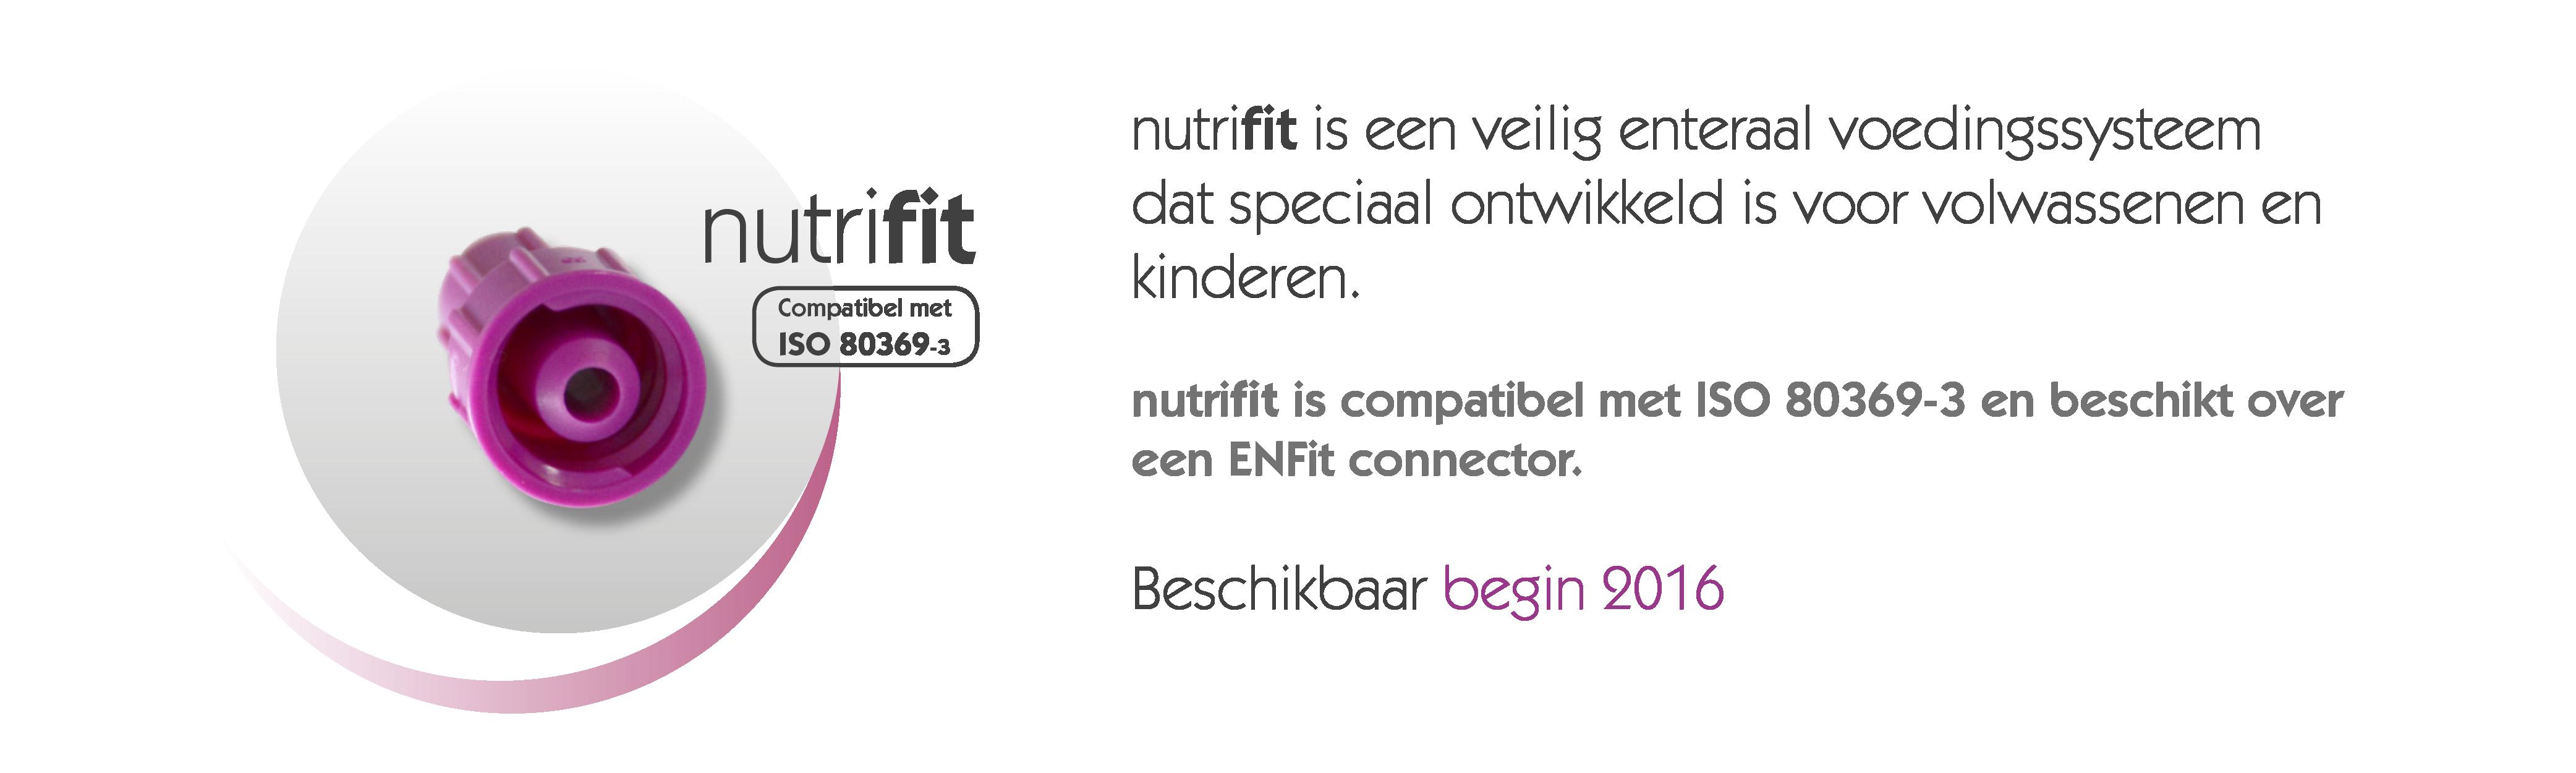 VY15137 - Slider Homepage Nutrifit (01.12.2015)